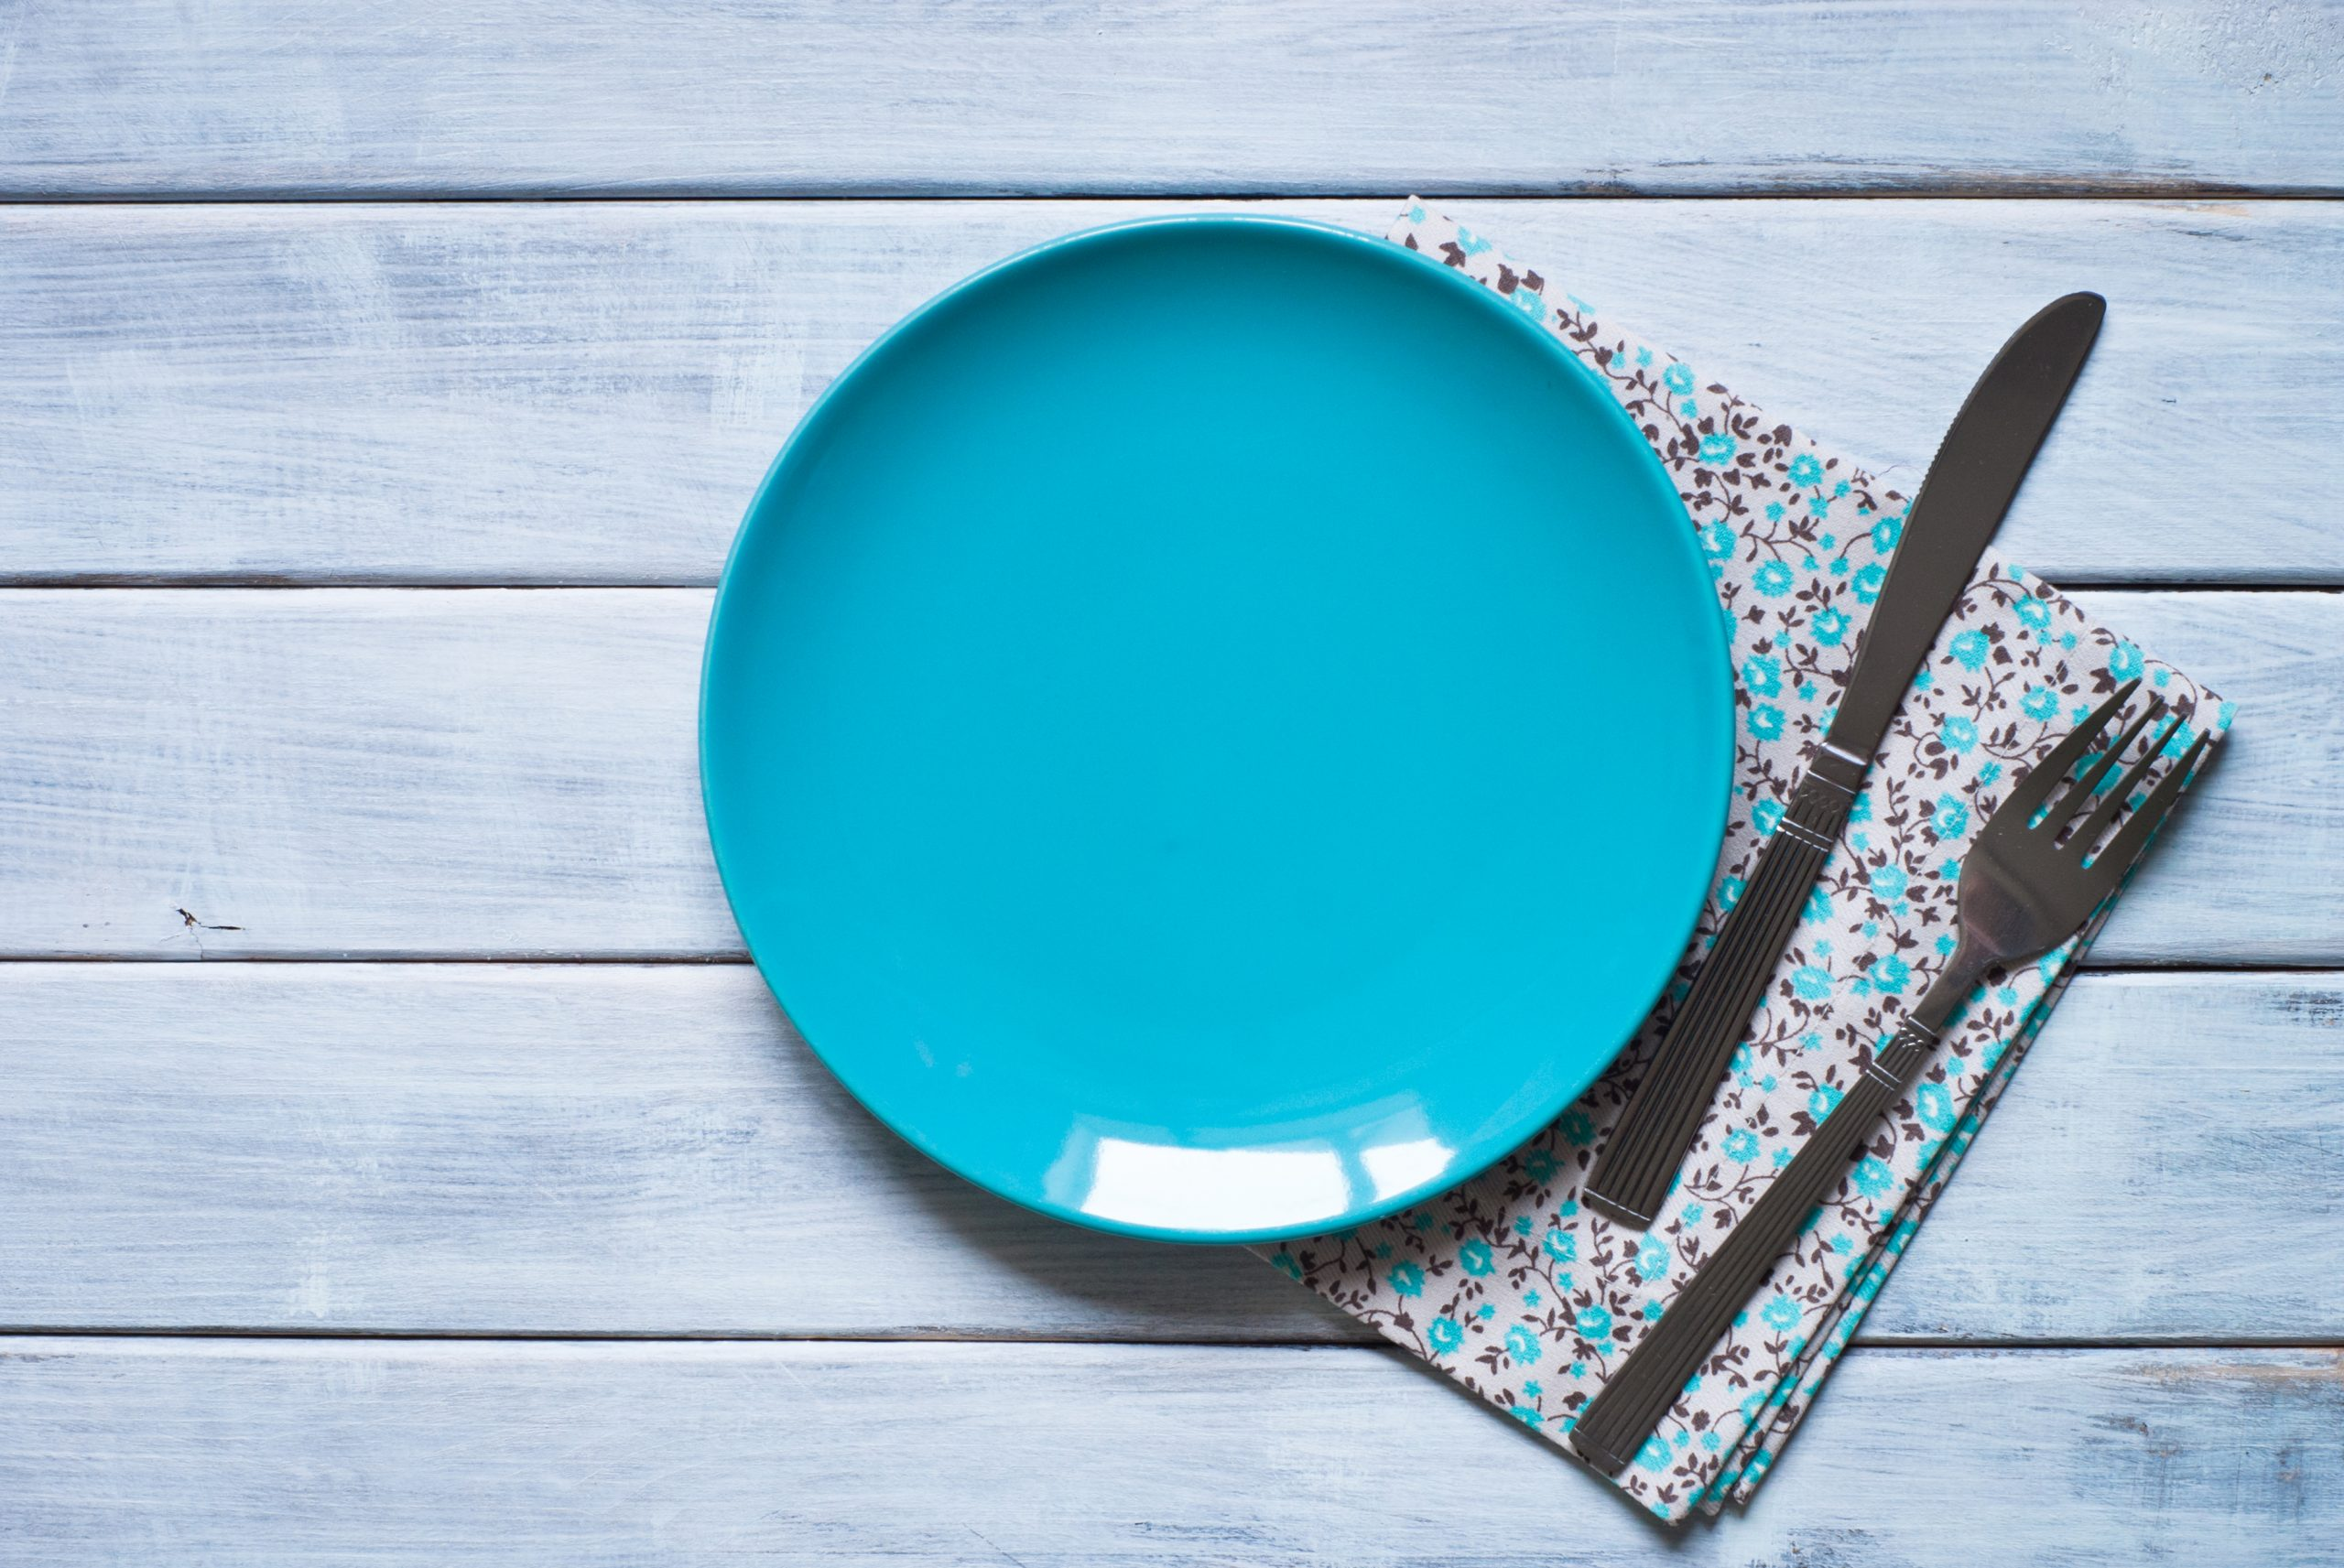 empty blue plate at wooden table 694LFJR scaled пандемия пандемия